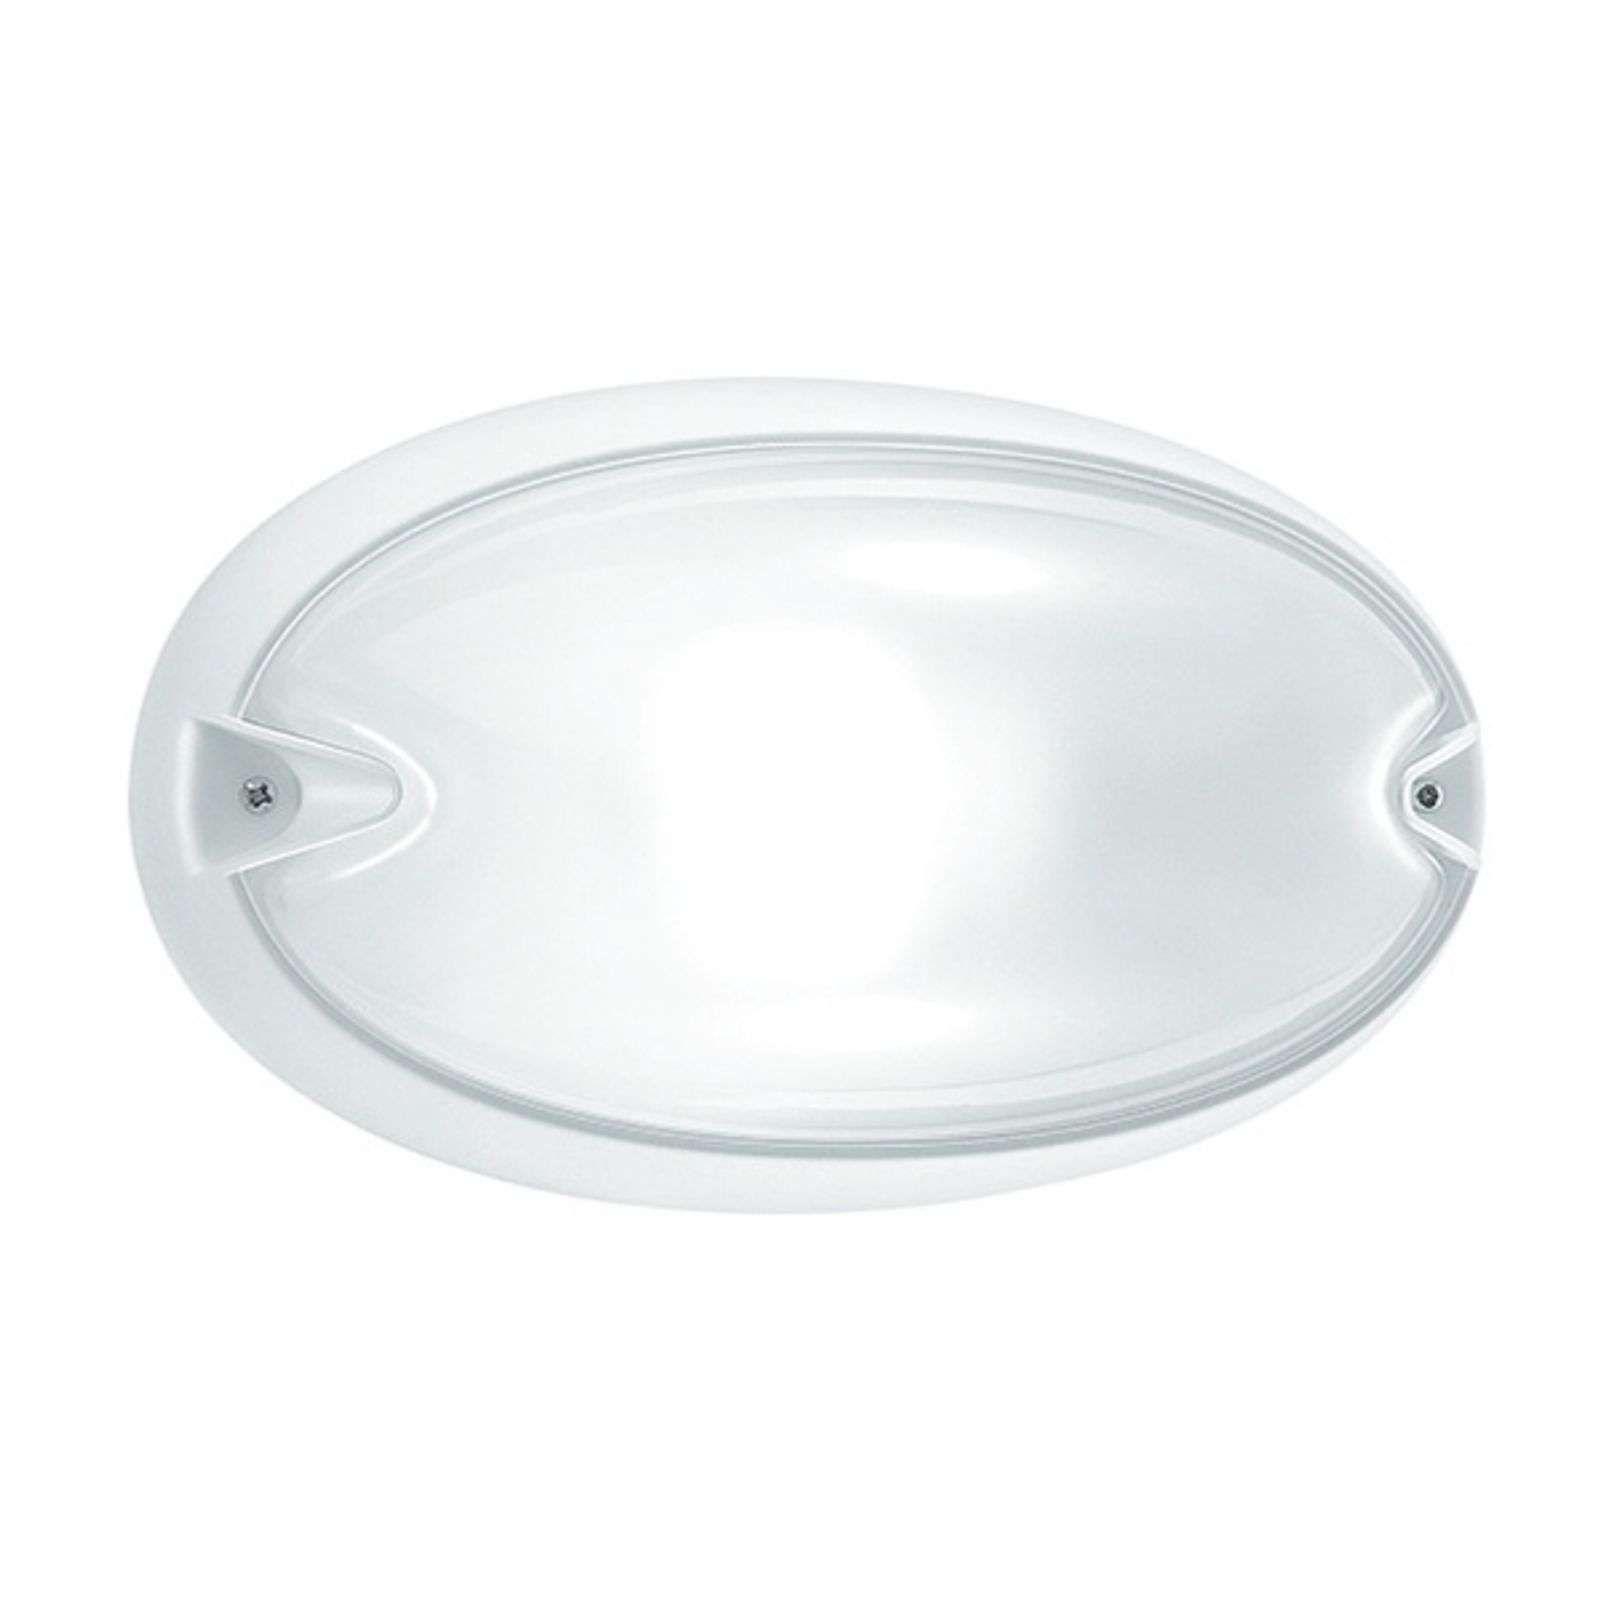 Ovale Aussenwandleuchte Chip Buitenlamp Wandlamp Binnenverlichting